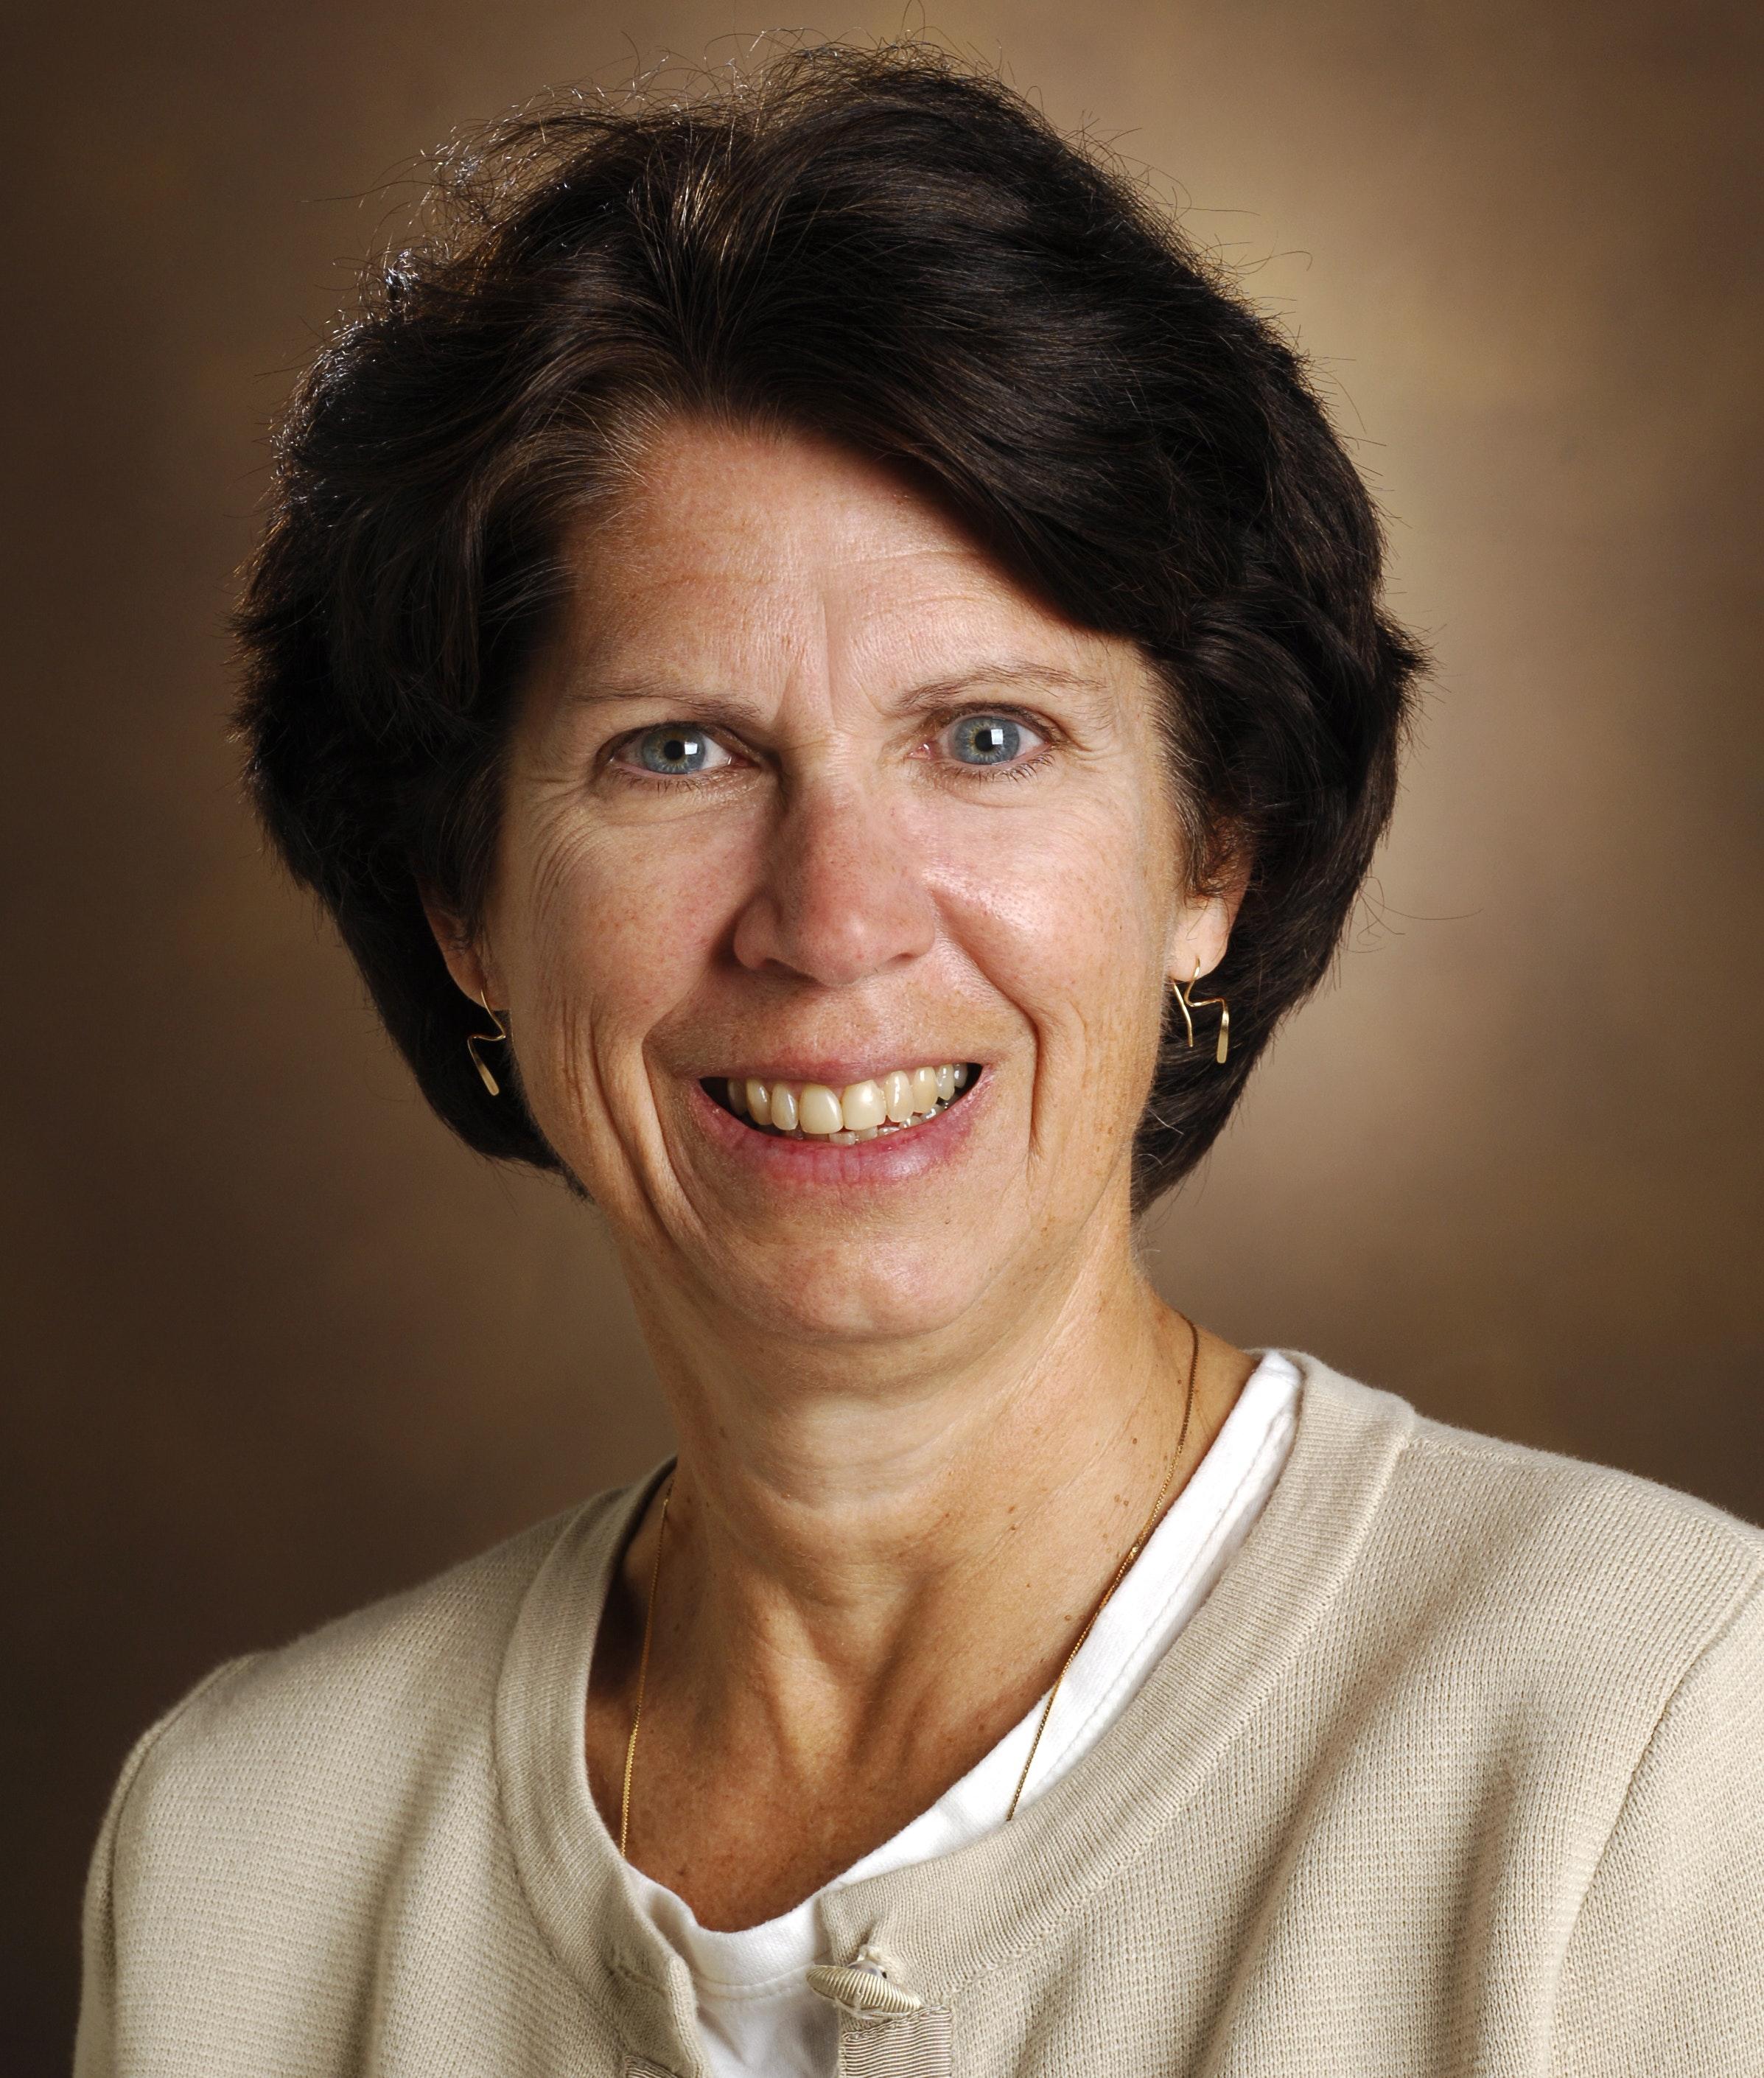 Barbara S. Stengel, Ph.D.